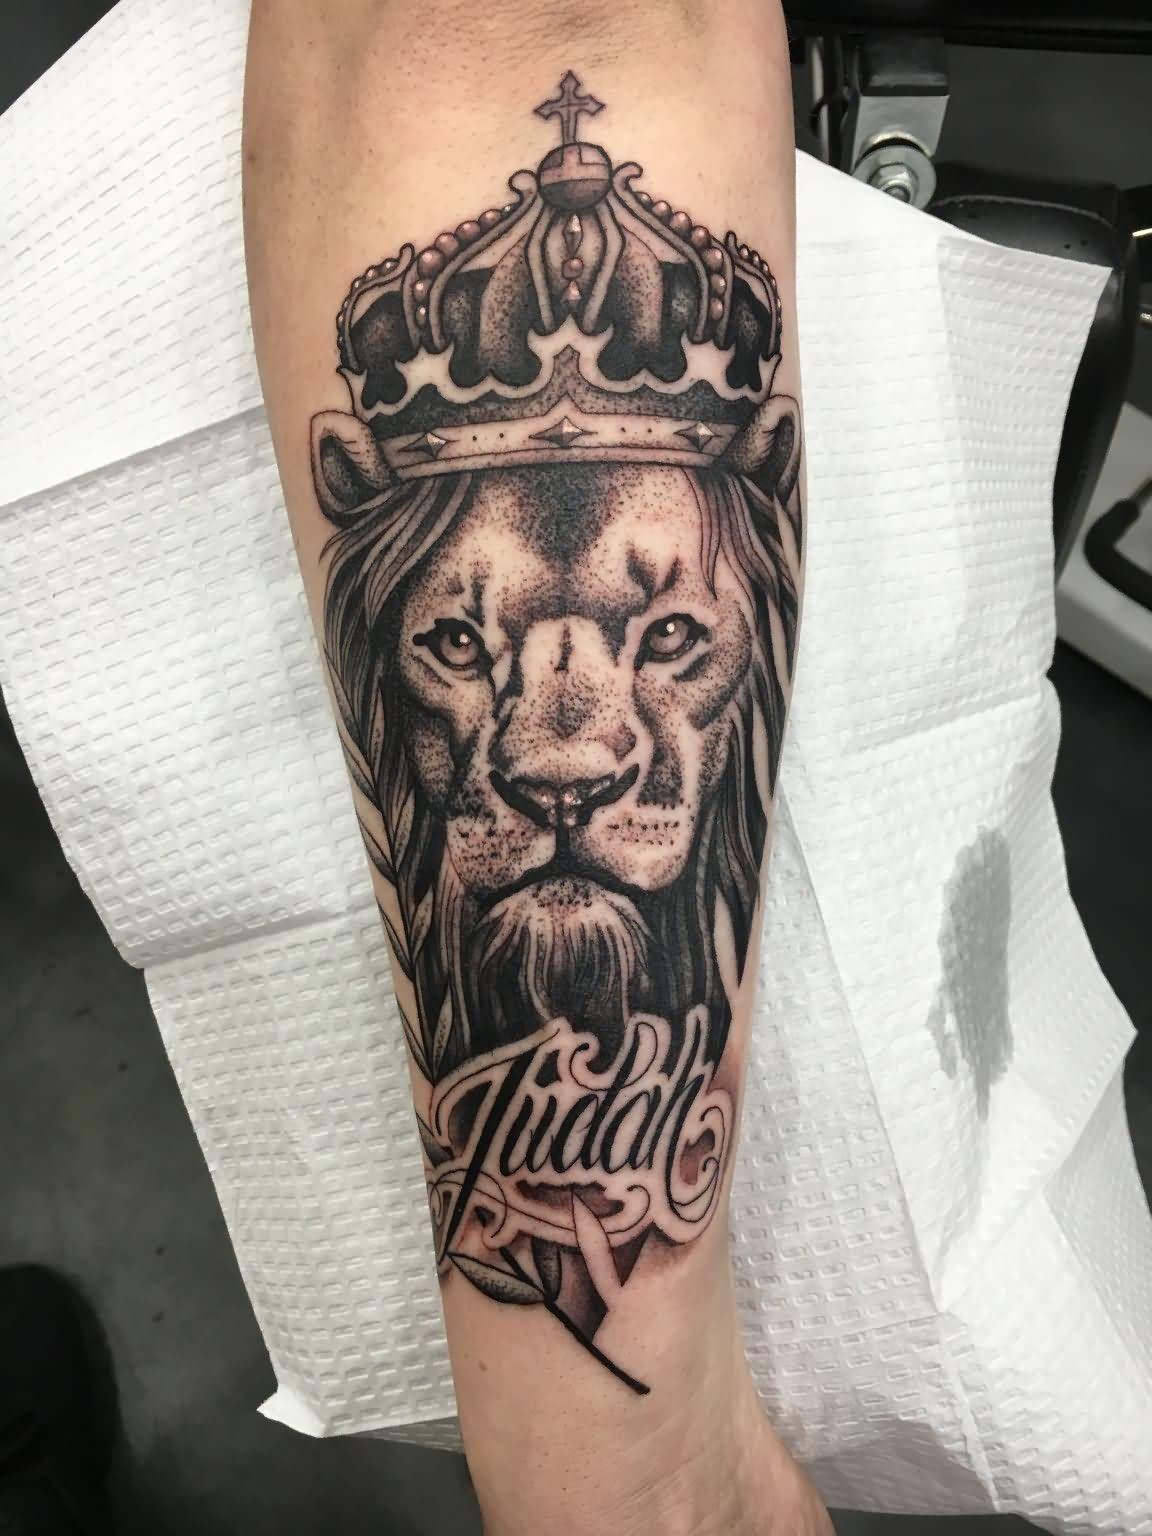 Black Ink Crown On Lion Head Tattoo On Left Arm Kohen Meyers inside proportions 1152 X 1536